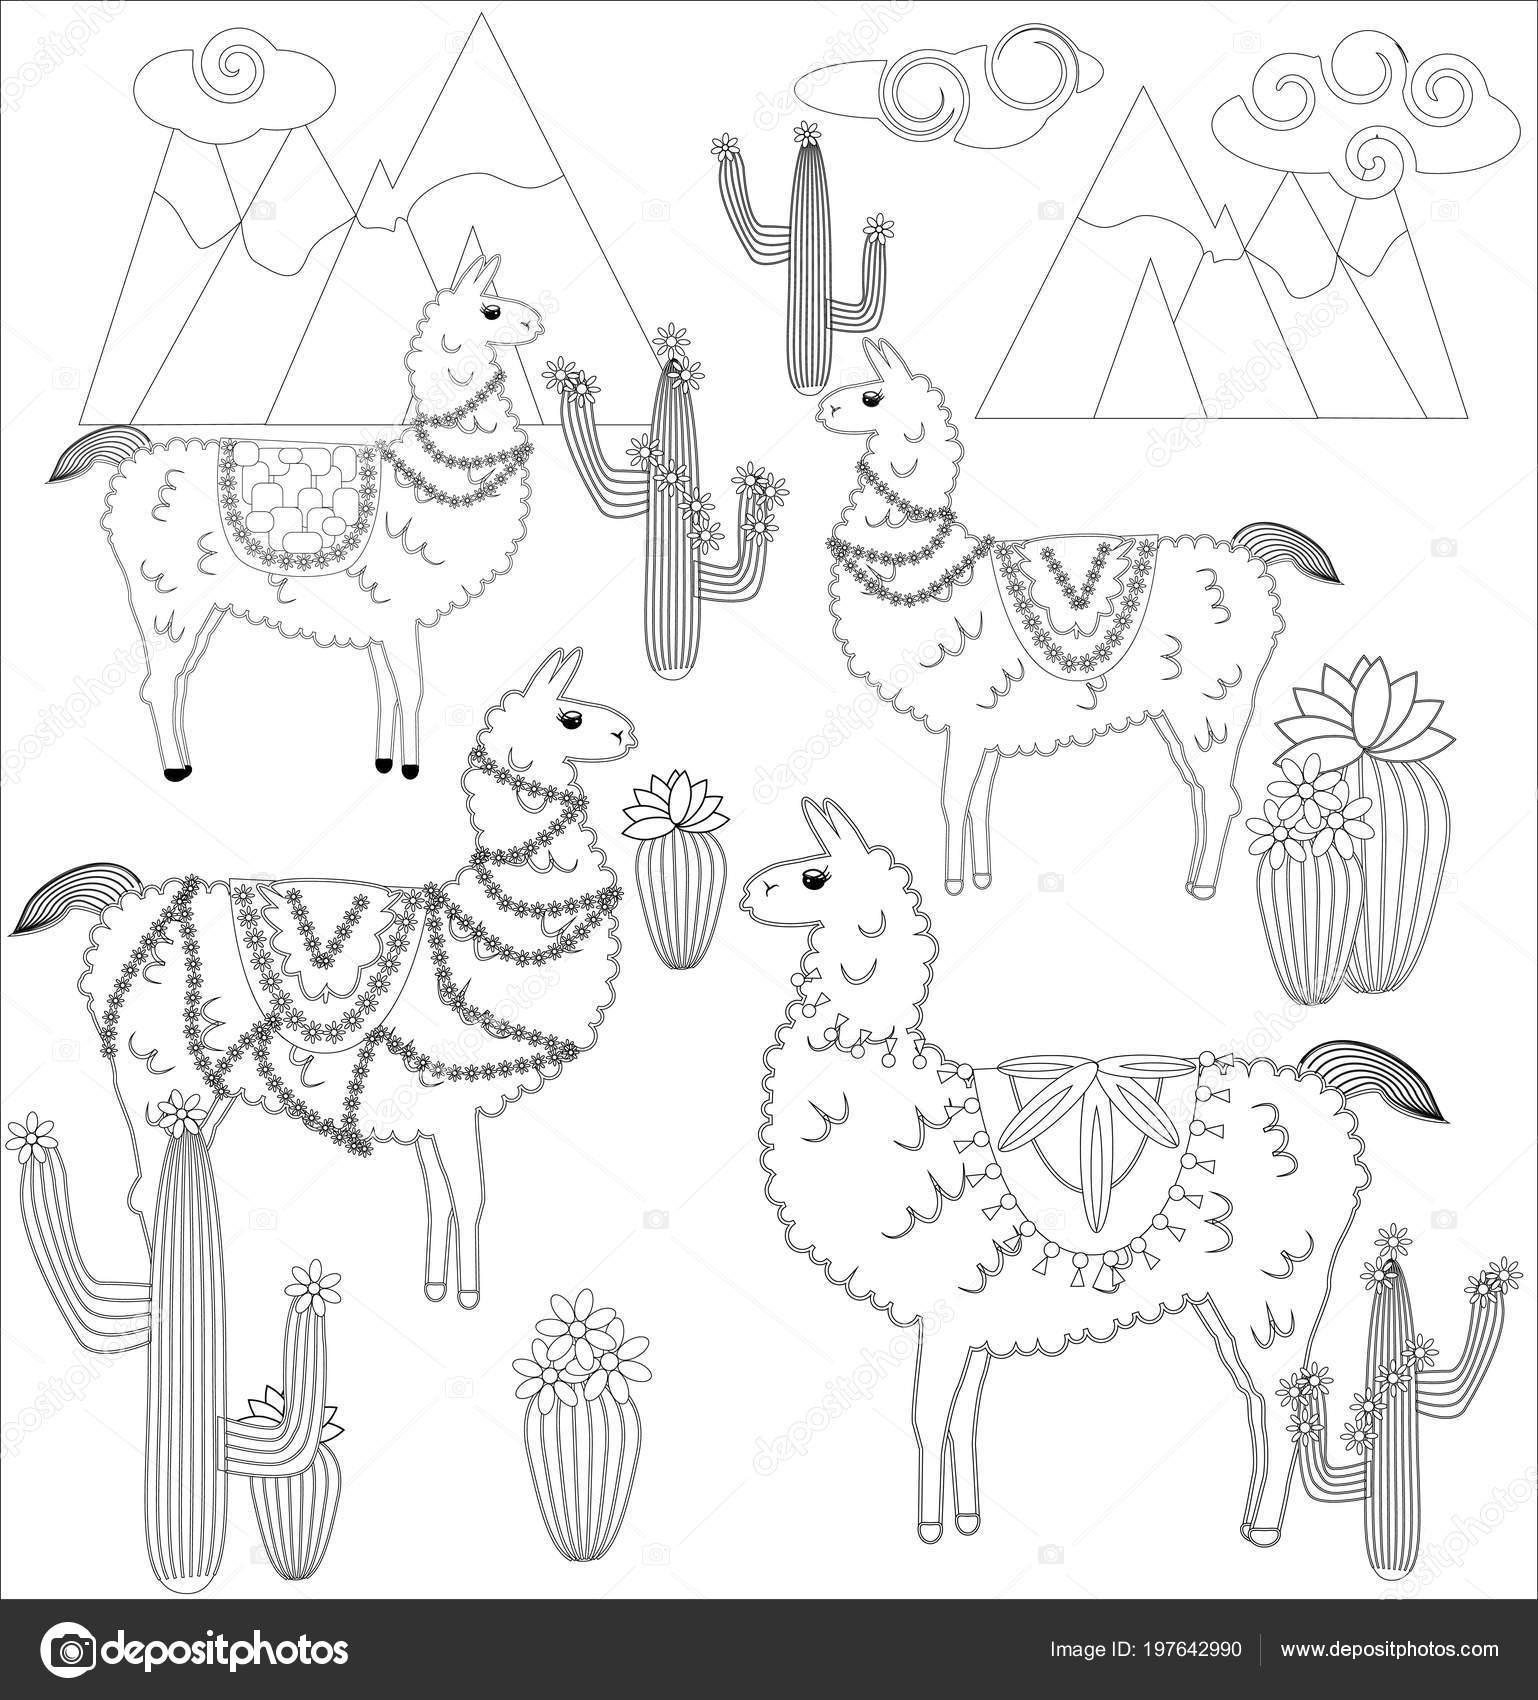 potencialis: lama malvorlagen